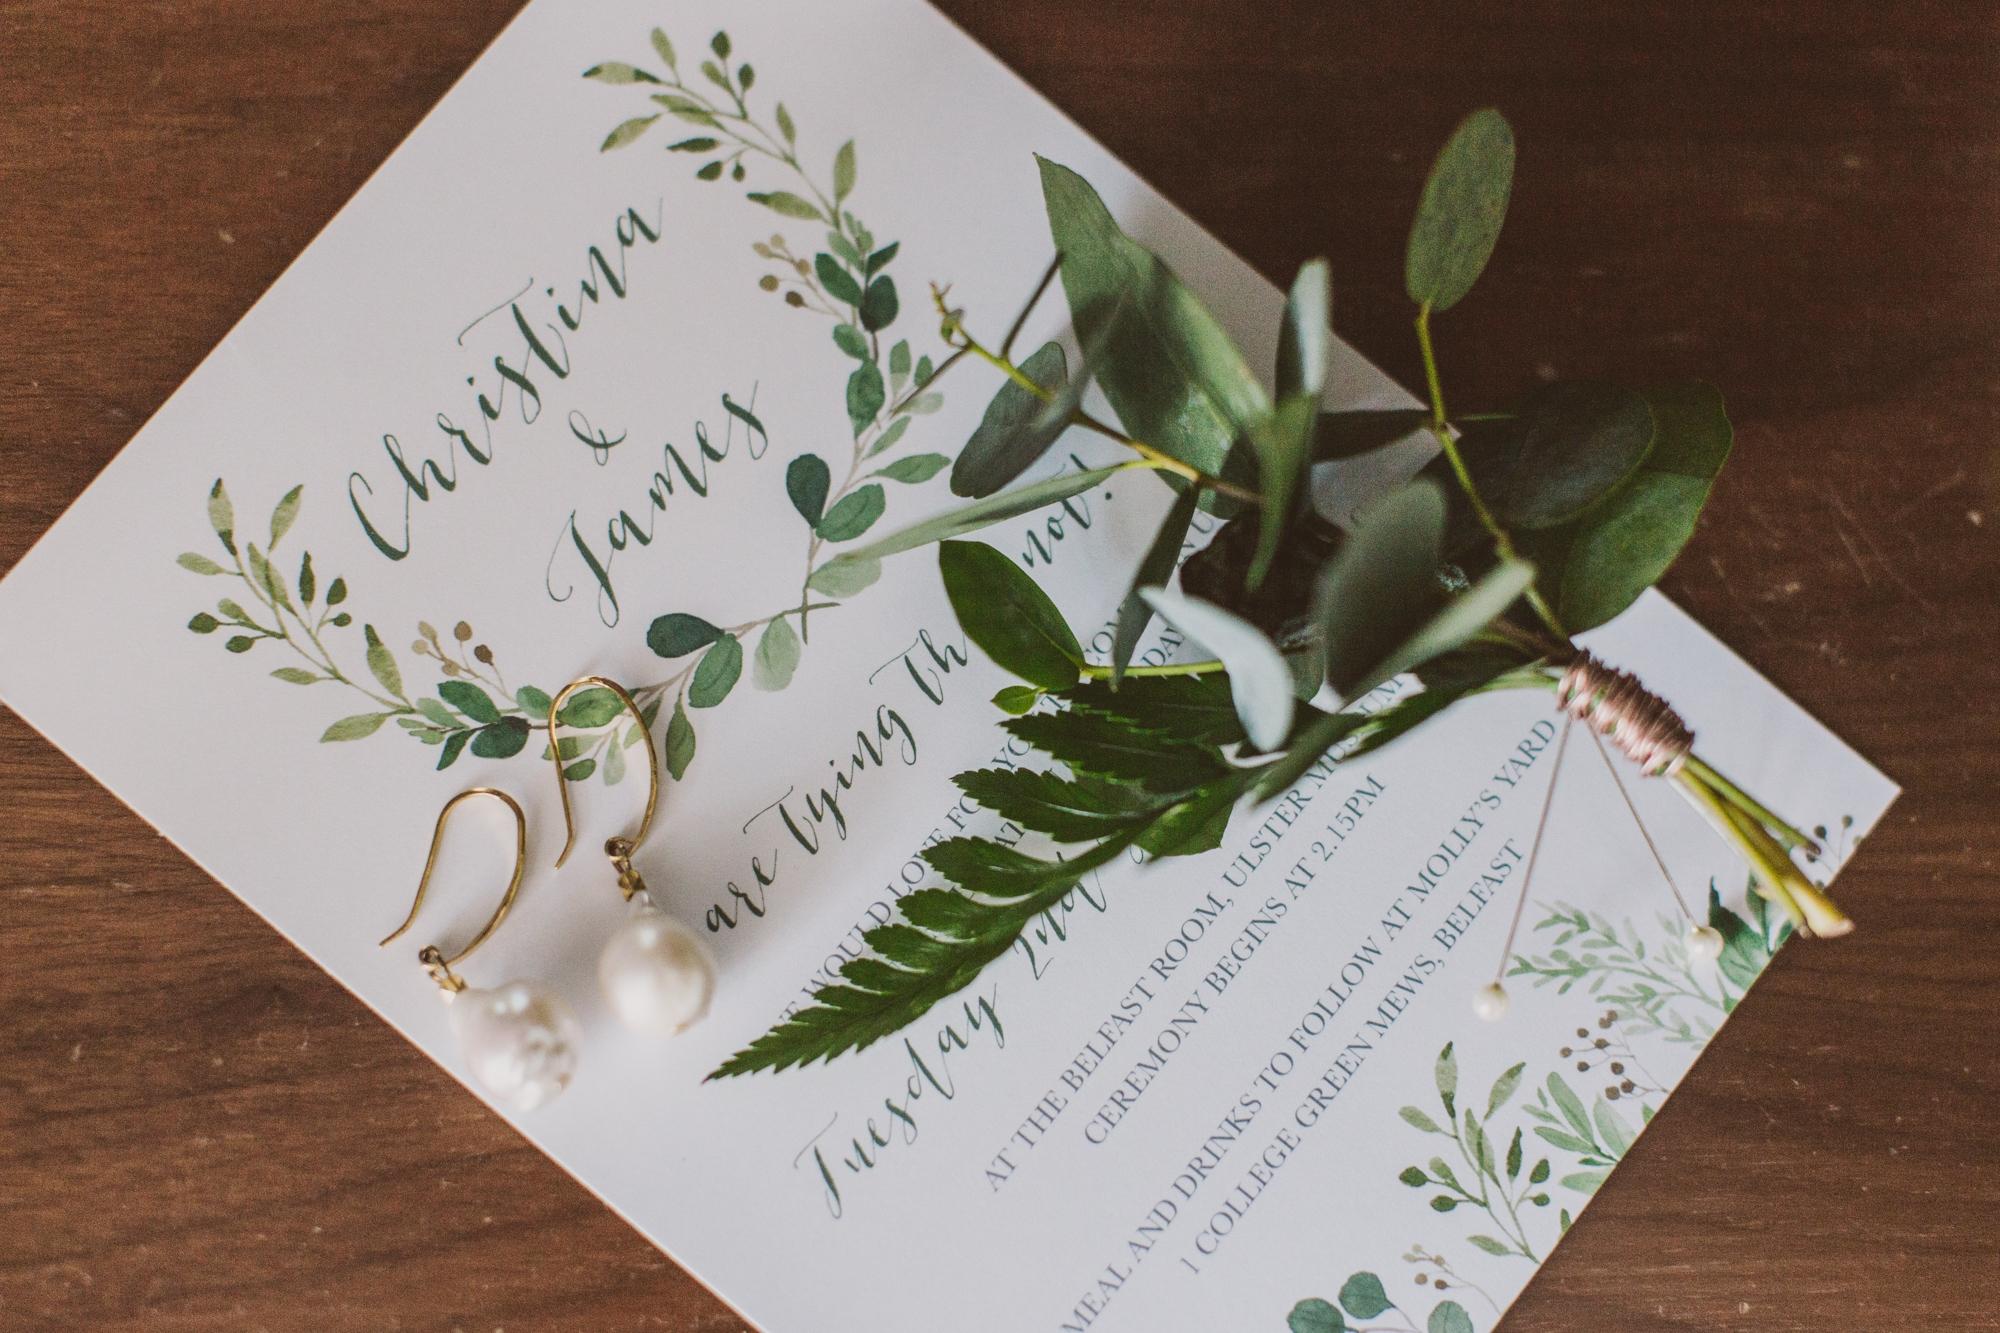 City_Centre_northern_ireland_wedding_inspire_weddings_3.jpg